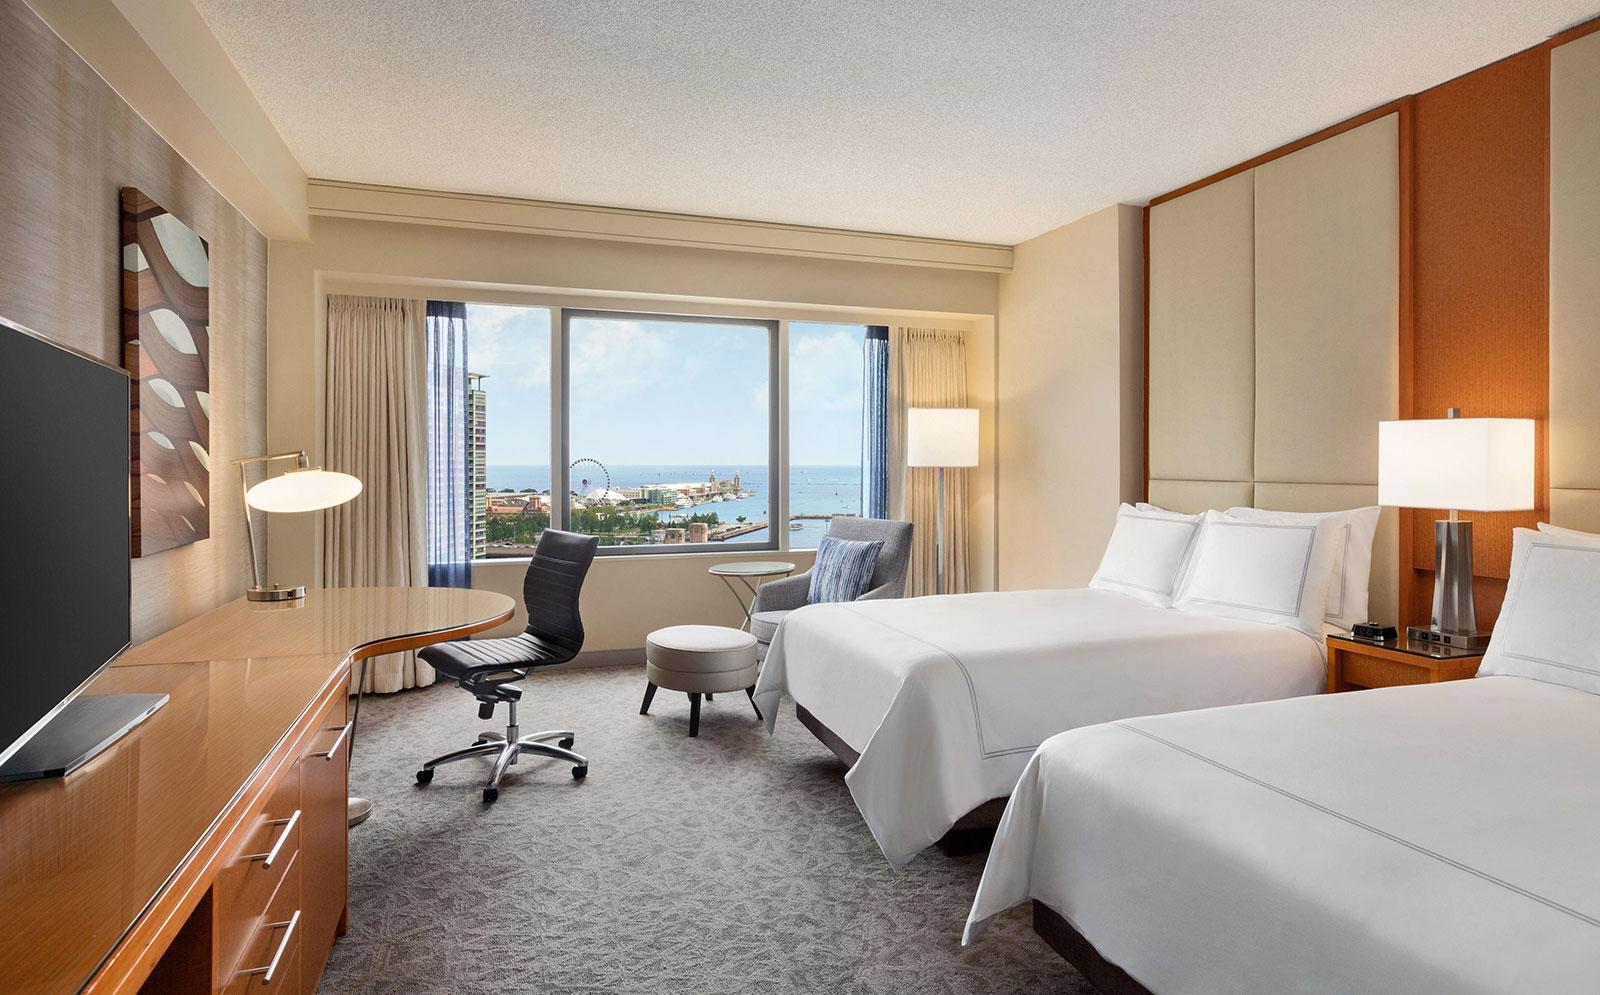 Swisshotel Chicago lake view double room